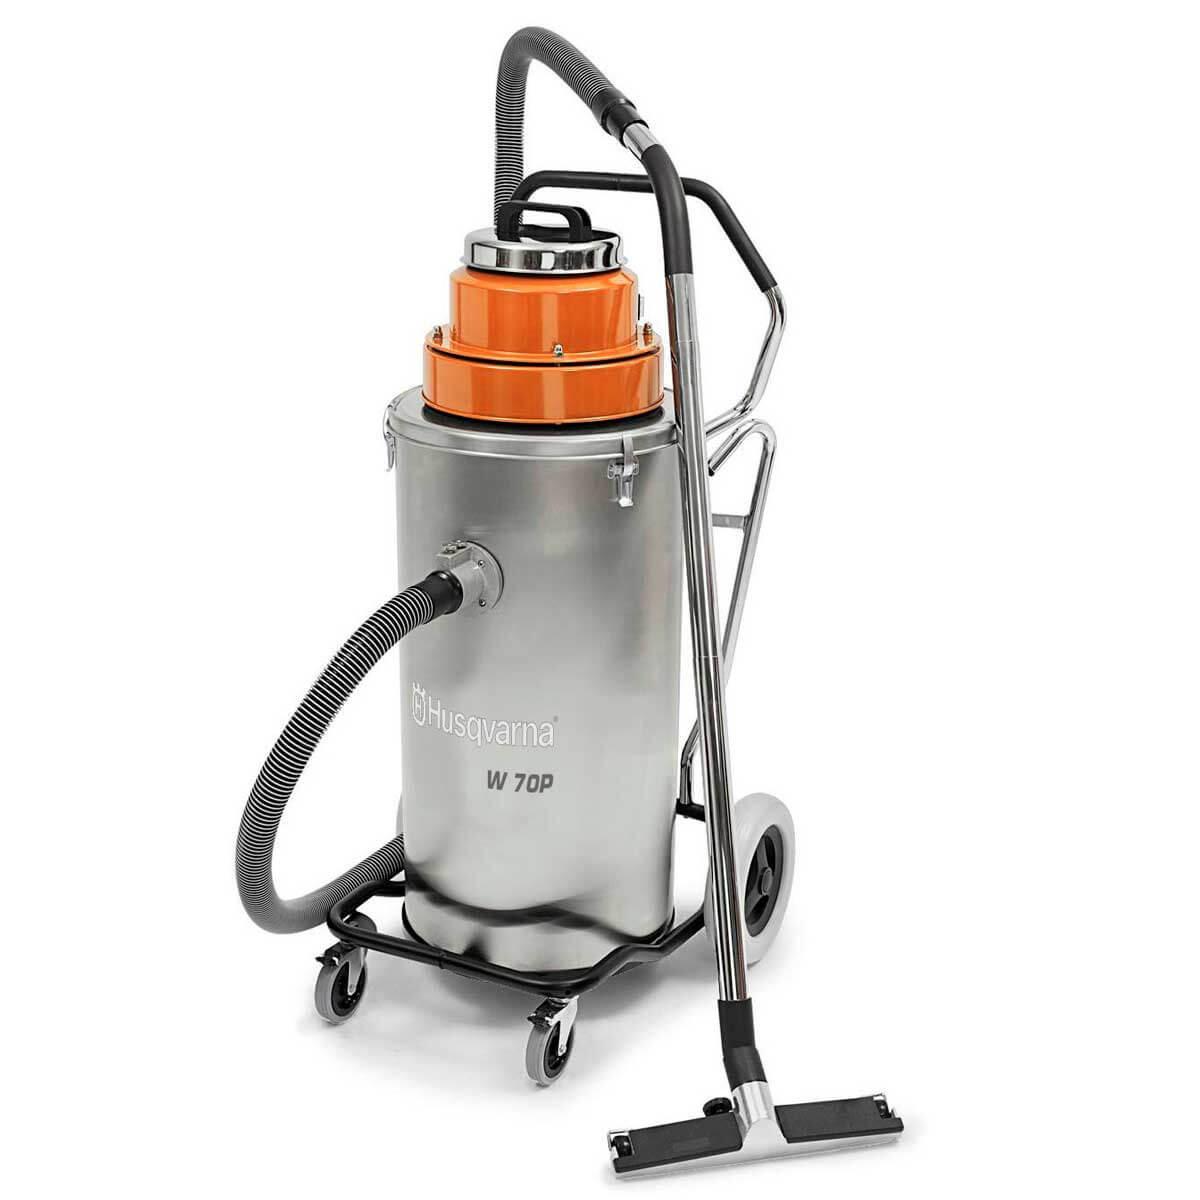 W70P Pullman Ermator Wet Dry vacuum